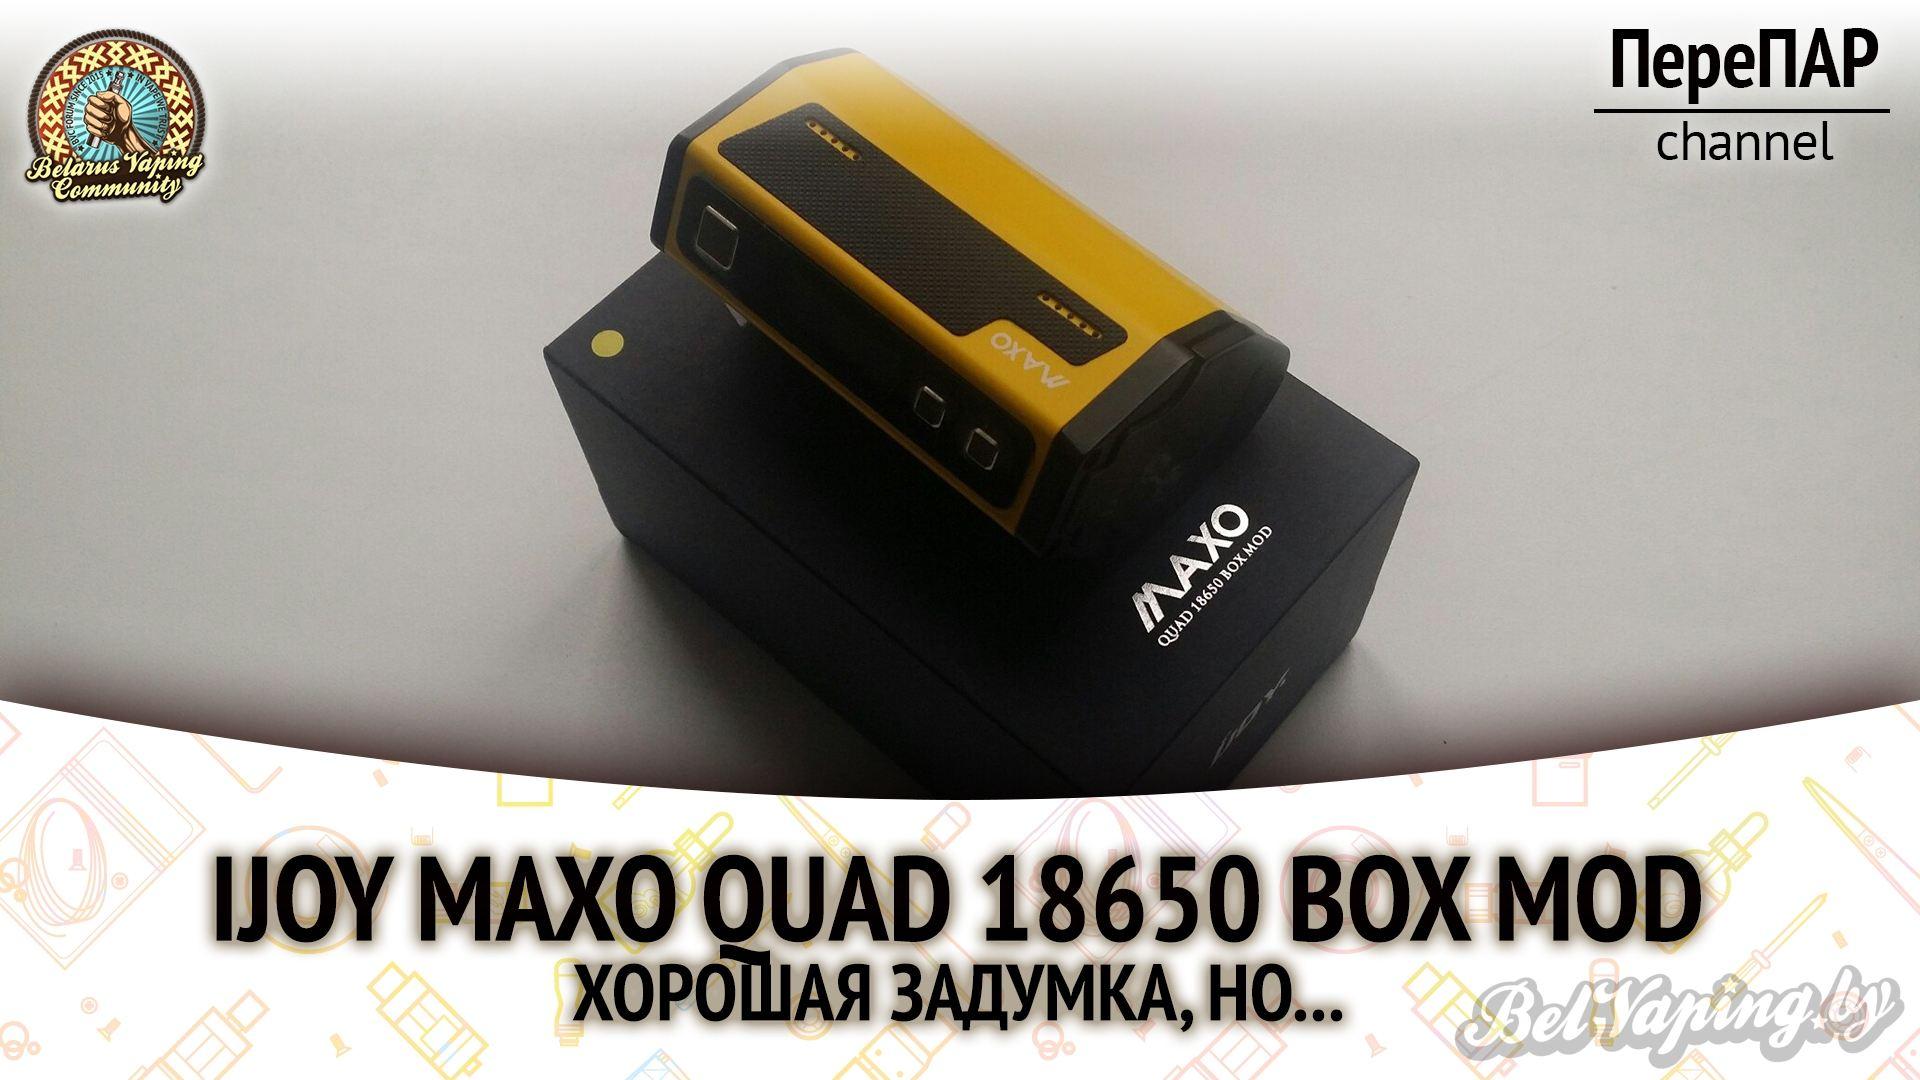 Обзор IJOY MAXO QUAD 18650 BOX MOD